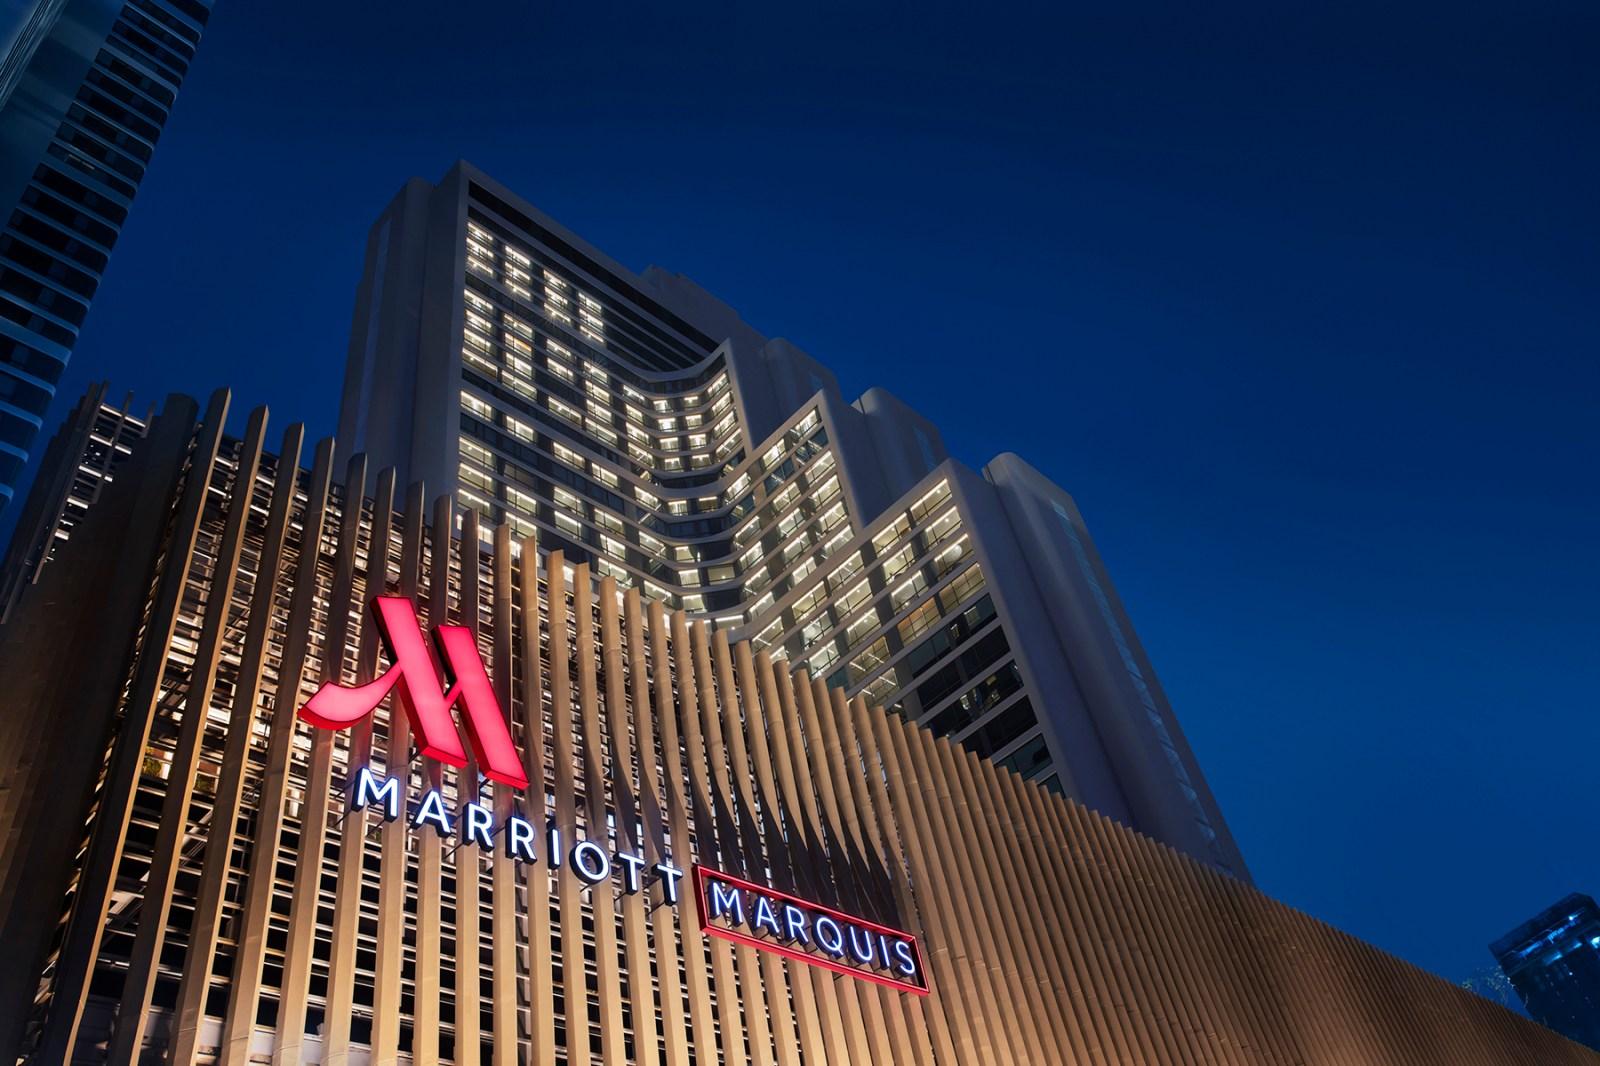 Marriott Marquis Queen's Park 於曼谷正式啟業